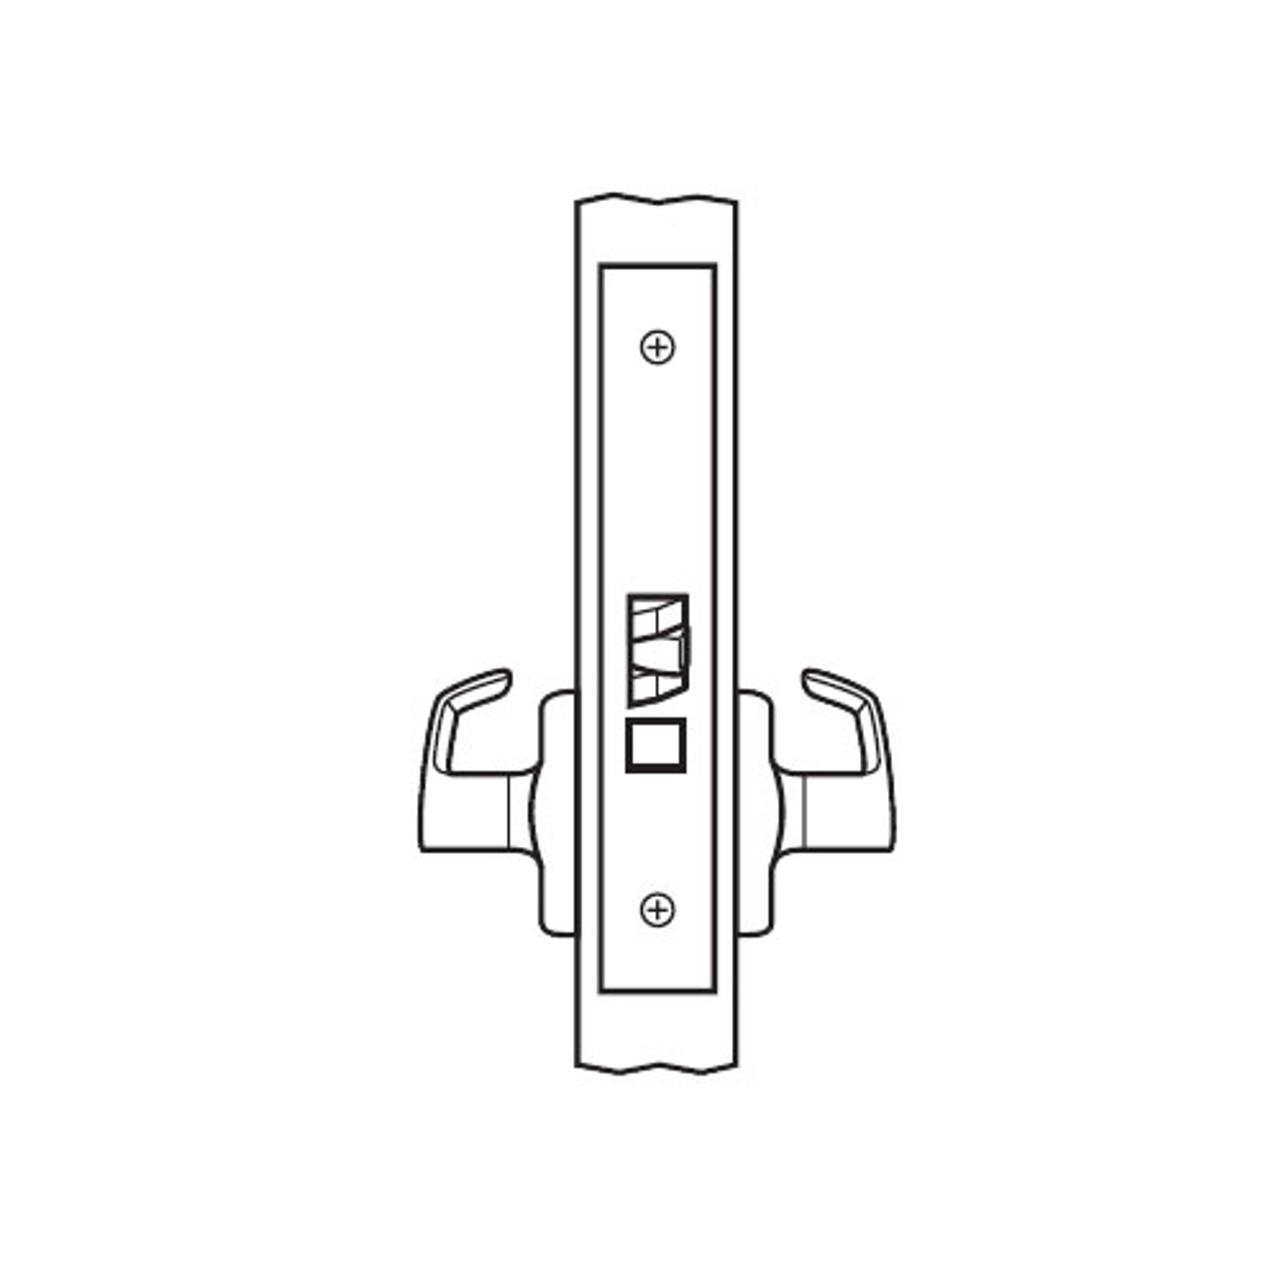 BM01-VL-26D Arrow Mortise Lock BM Series Passage Lever with Ventura Design in Satin Chrome